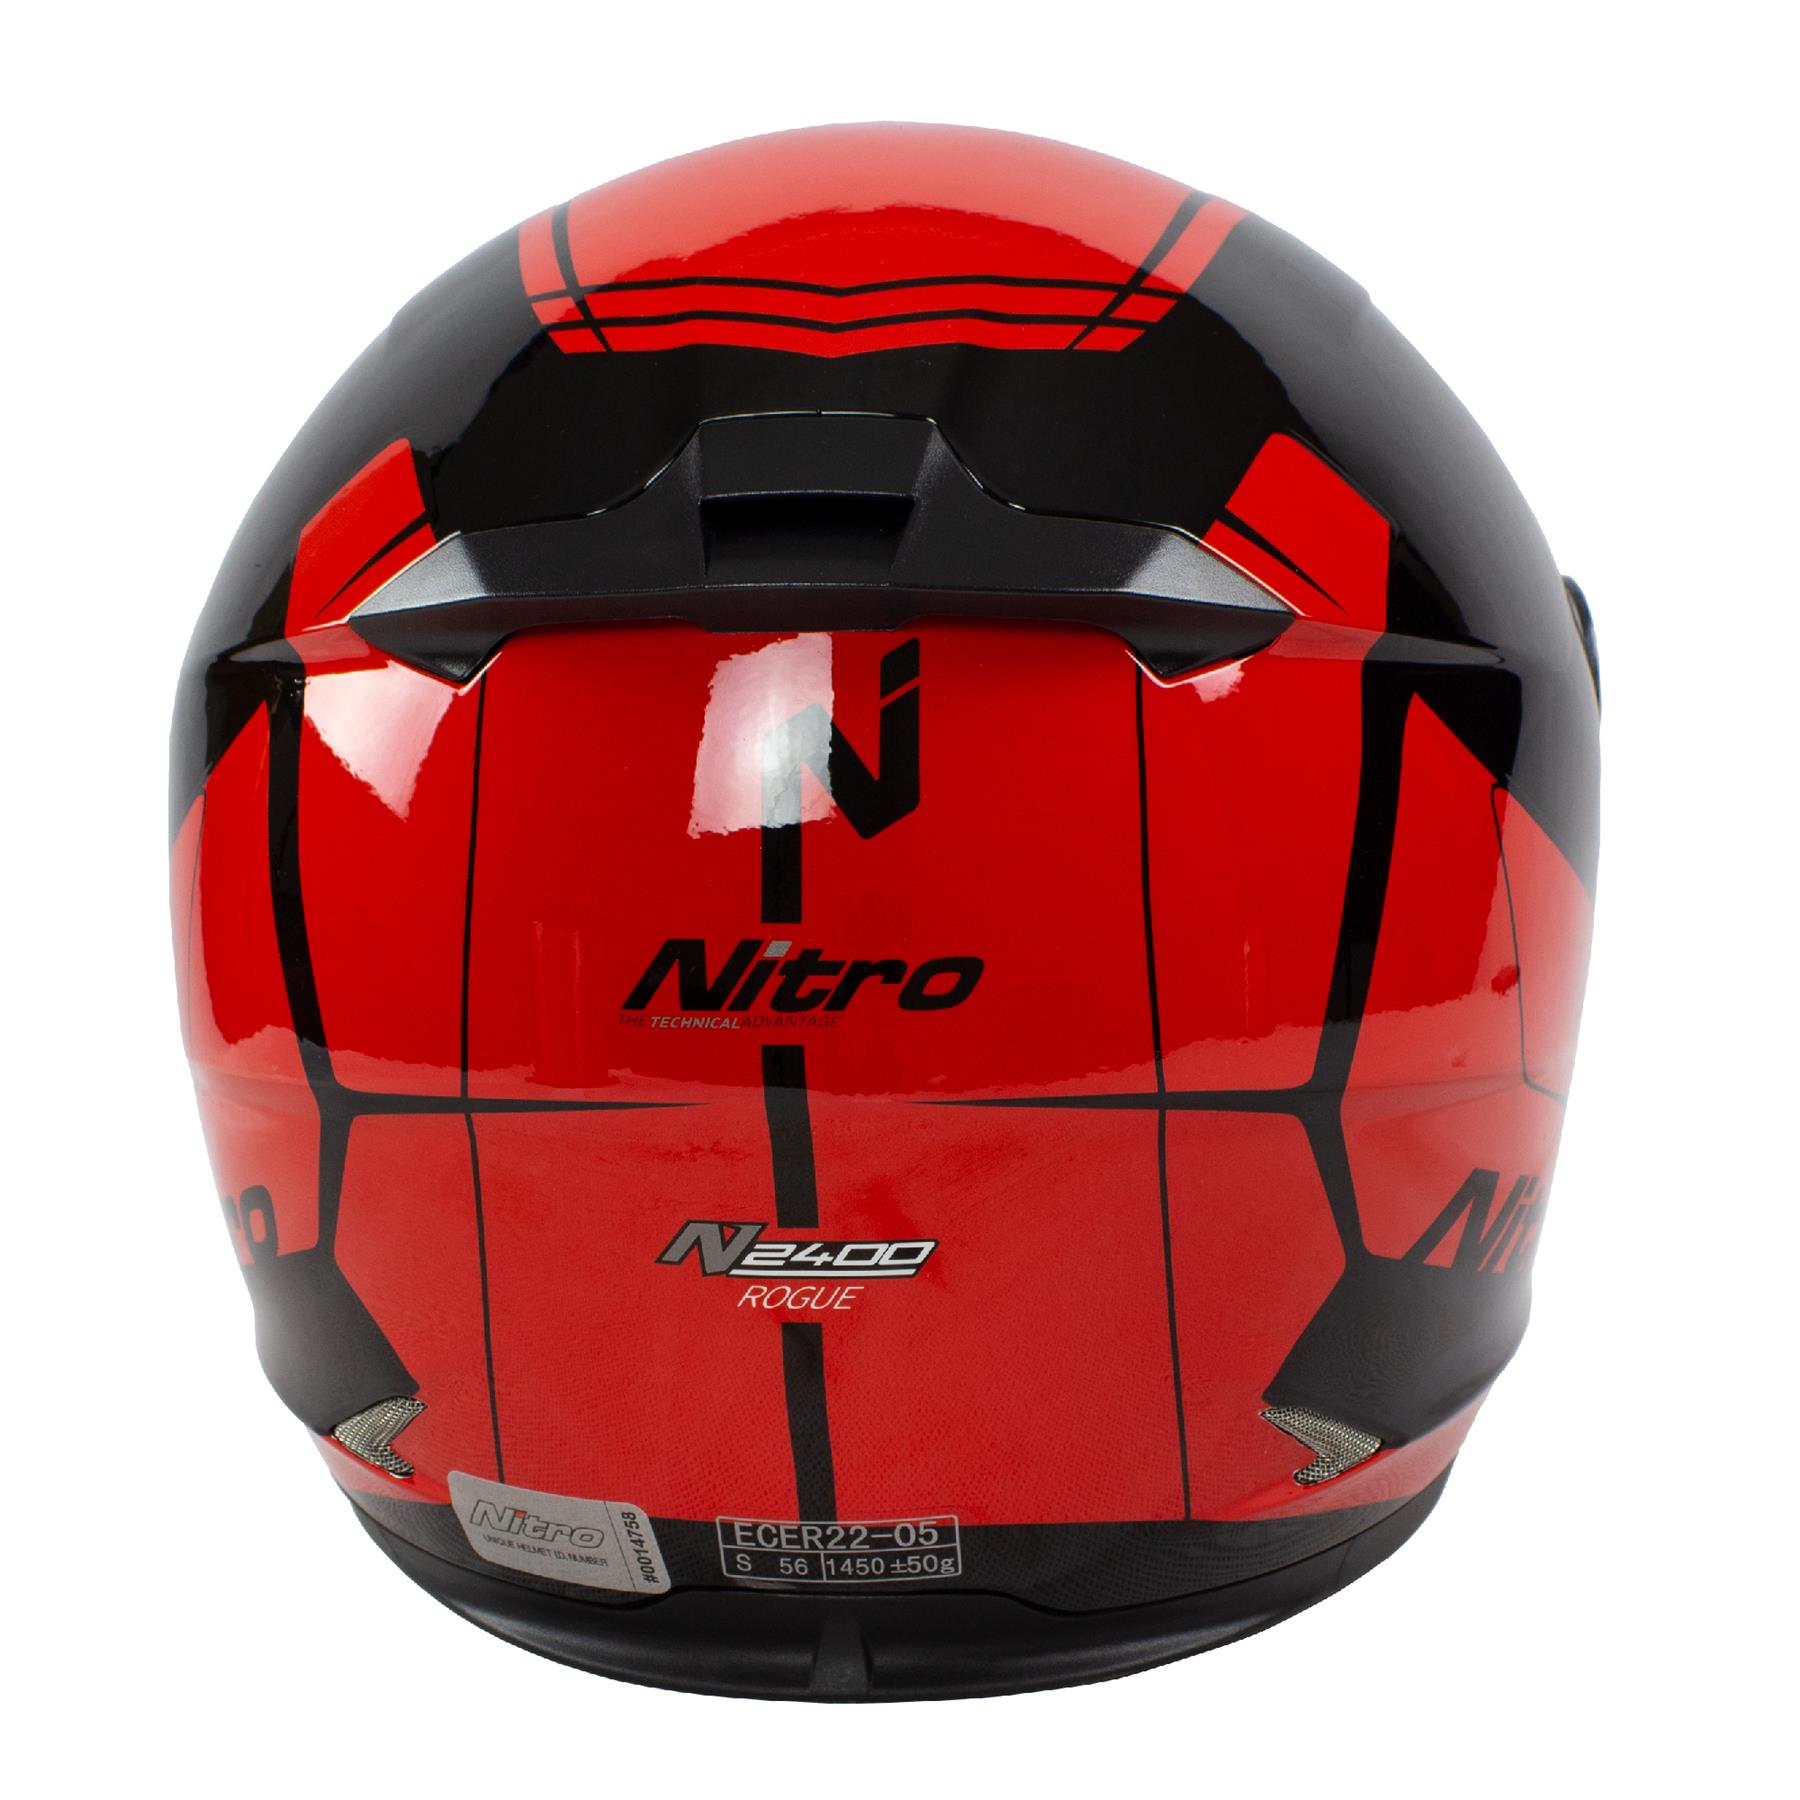 Nitro-N2400-Rogue-Full-Face-Motorcycle-Motorbike-Crash-Helmet-Black-Blue-Red thumbnail 22